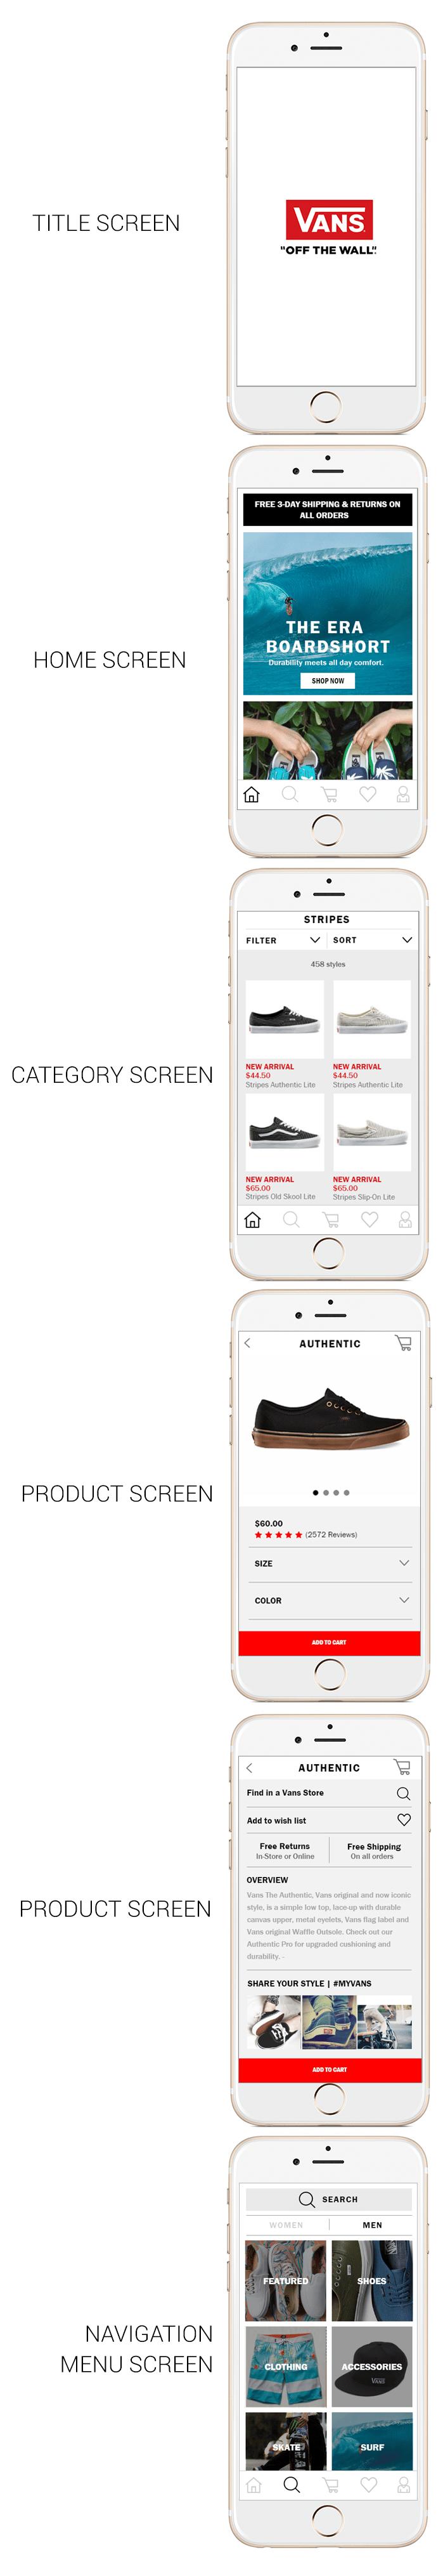 Mobile shopping app UI design - Vans - image 6 - student project